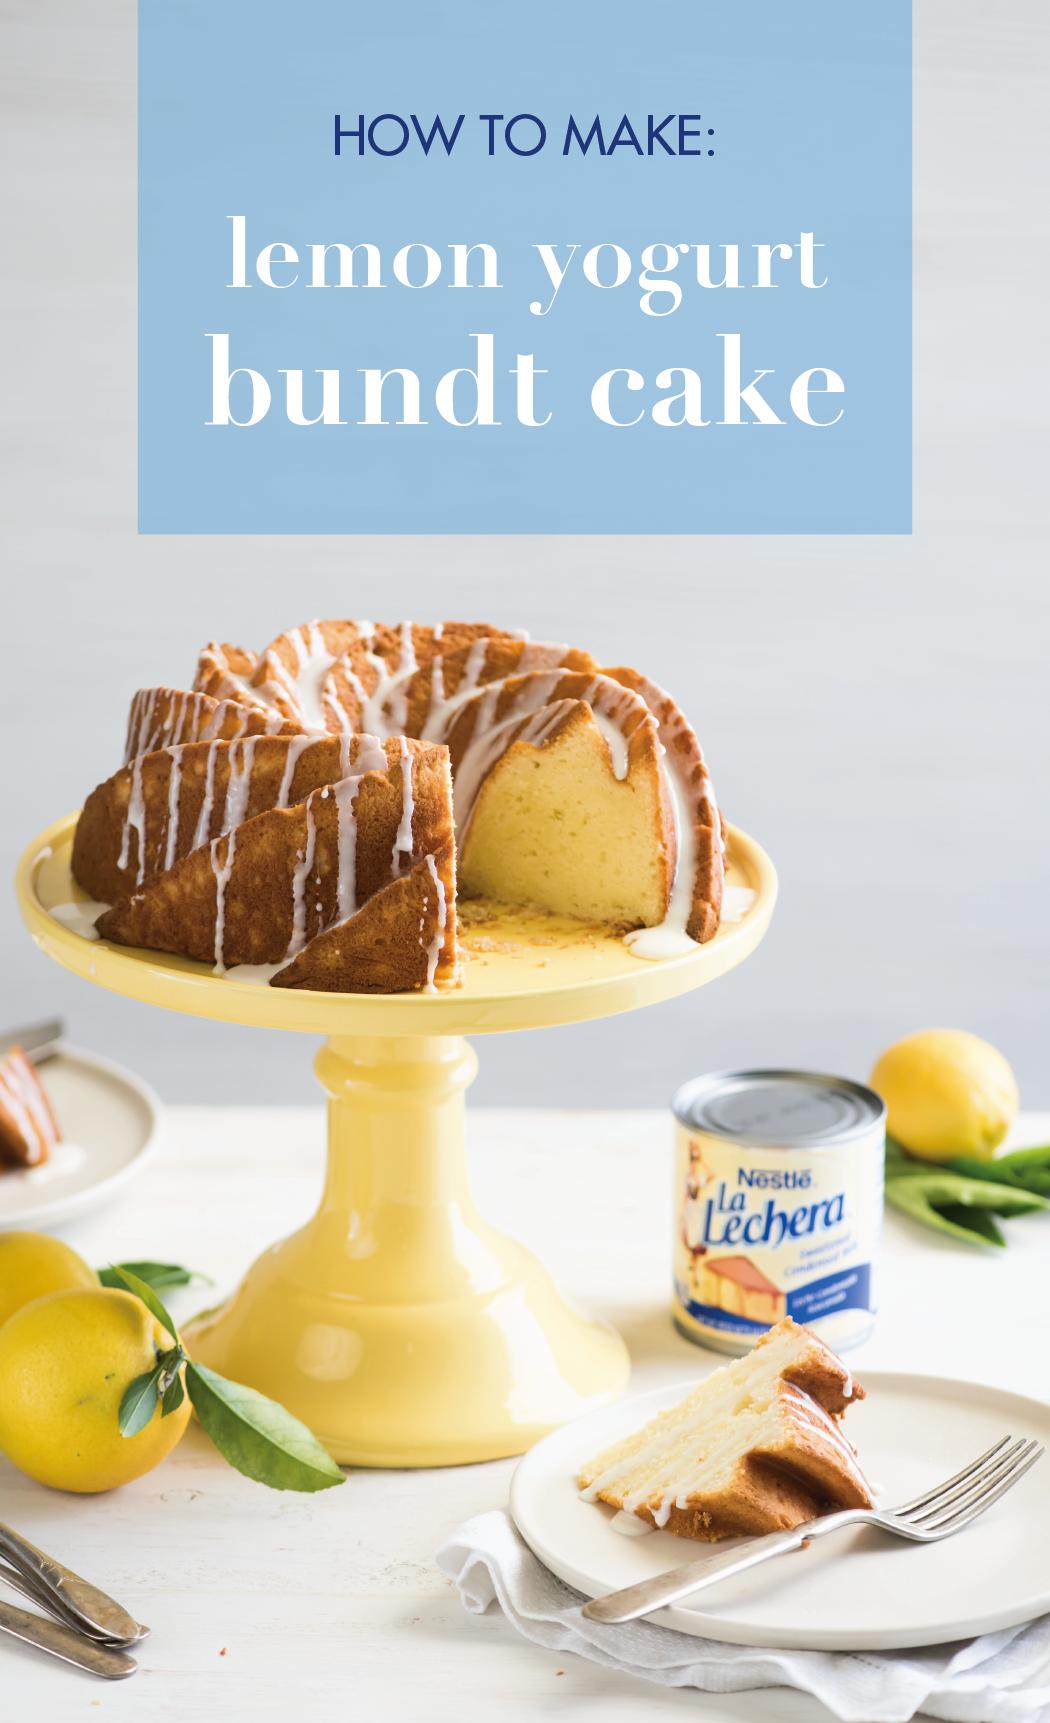 Photo of Lemon Yogurt Bundt Cake